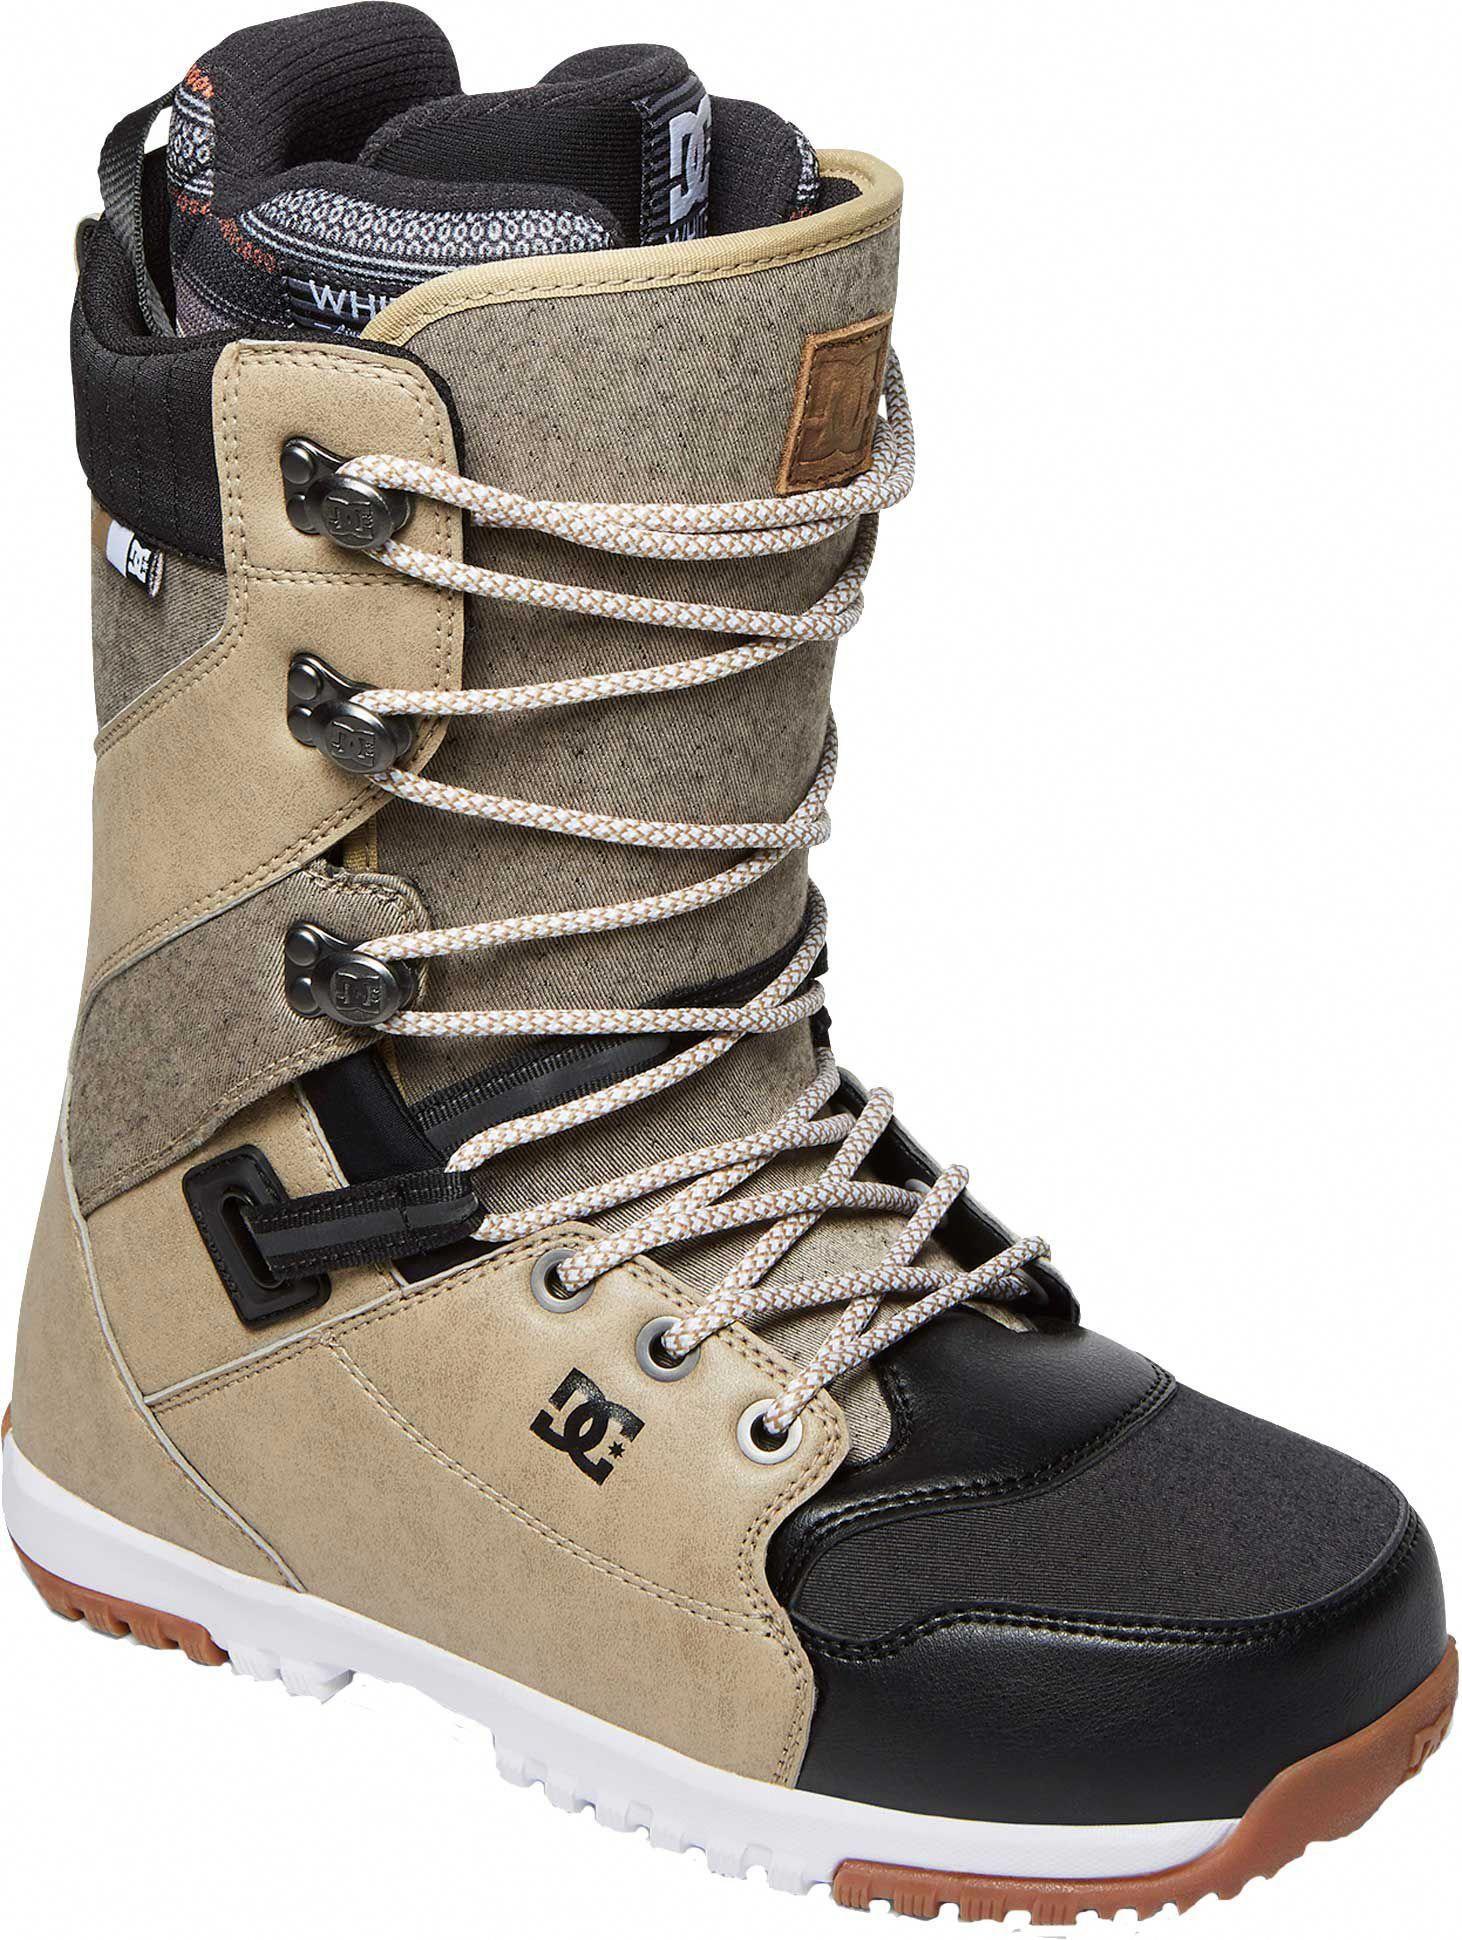 4acac9b9c7ea DC Shoes Men s Mutiny 2017-2018 Snowboard Boots  WinterFun